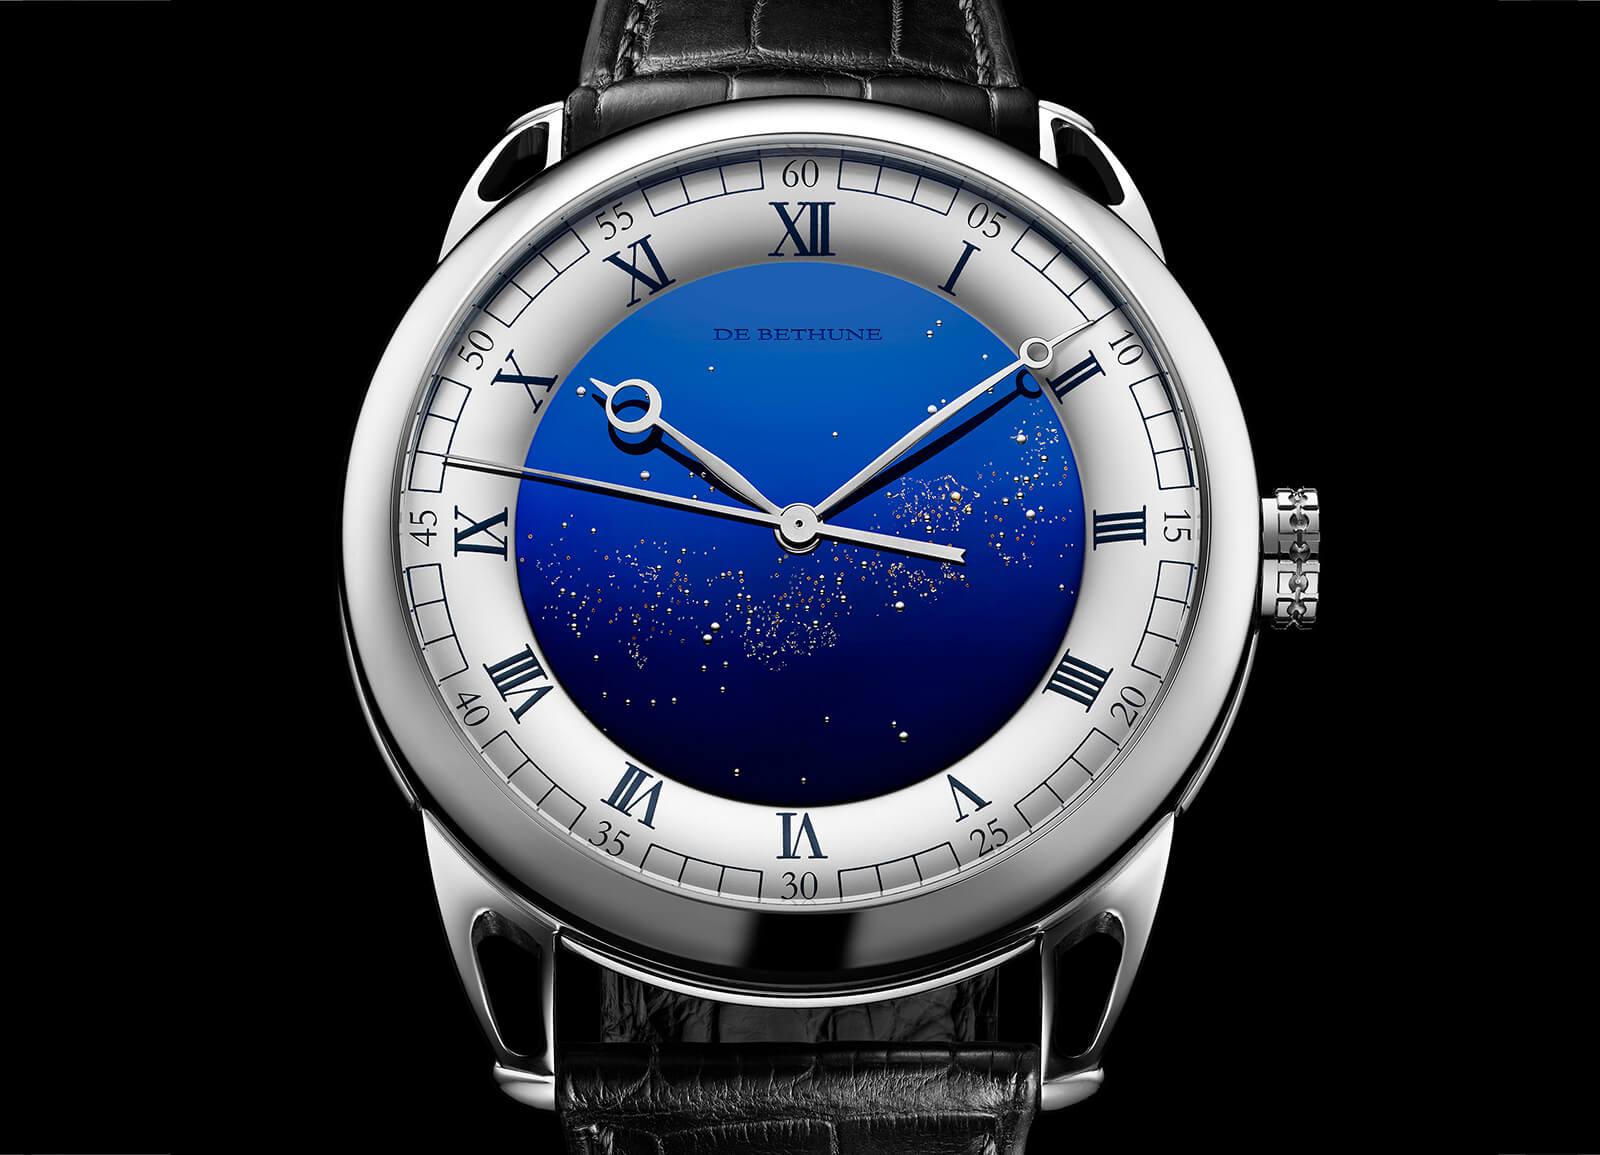 De Bethune DB25 Starry Varius Chronomètre Tourbillon Watch